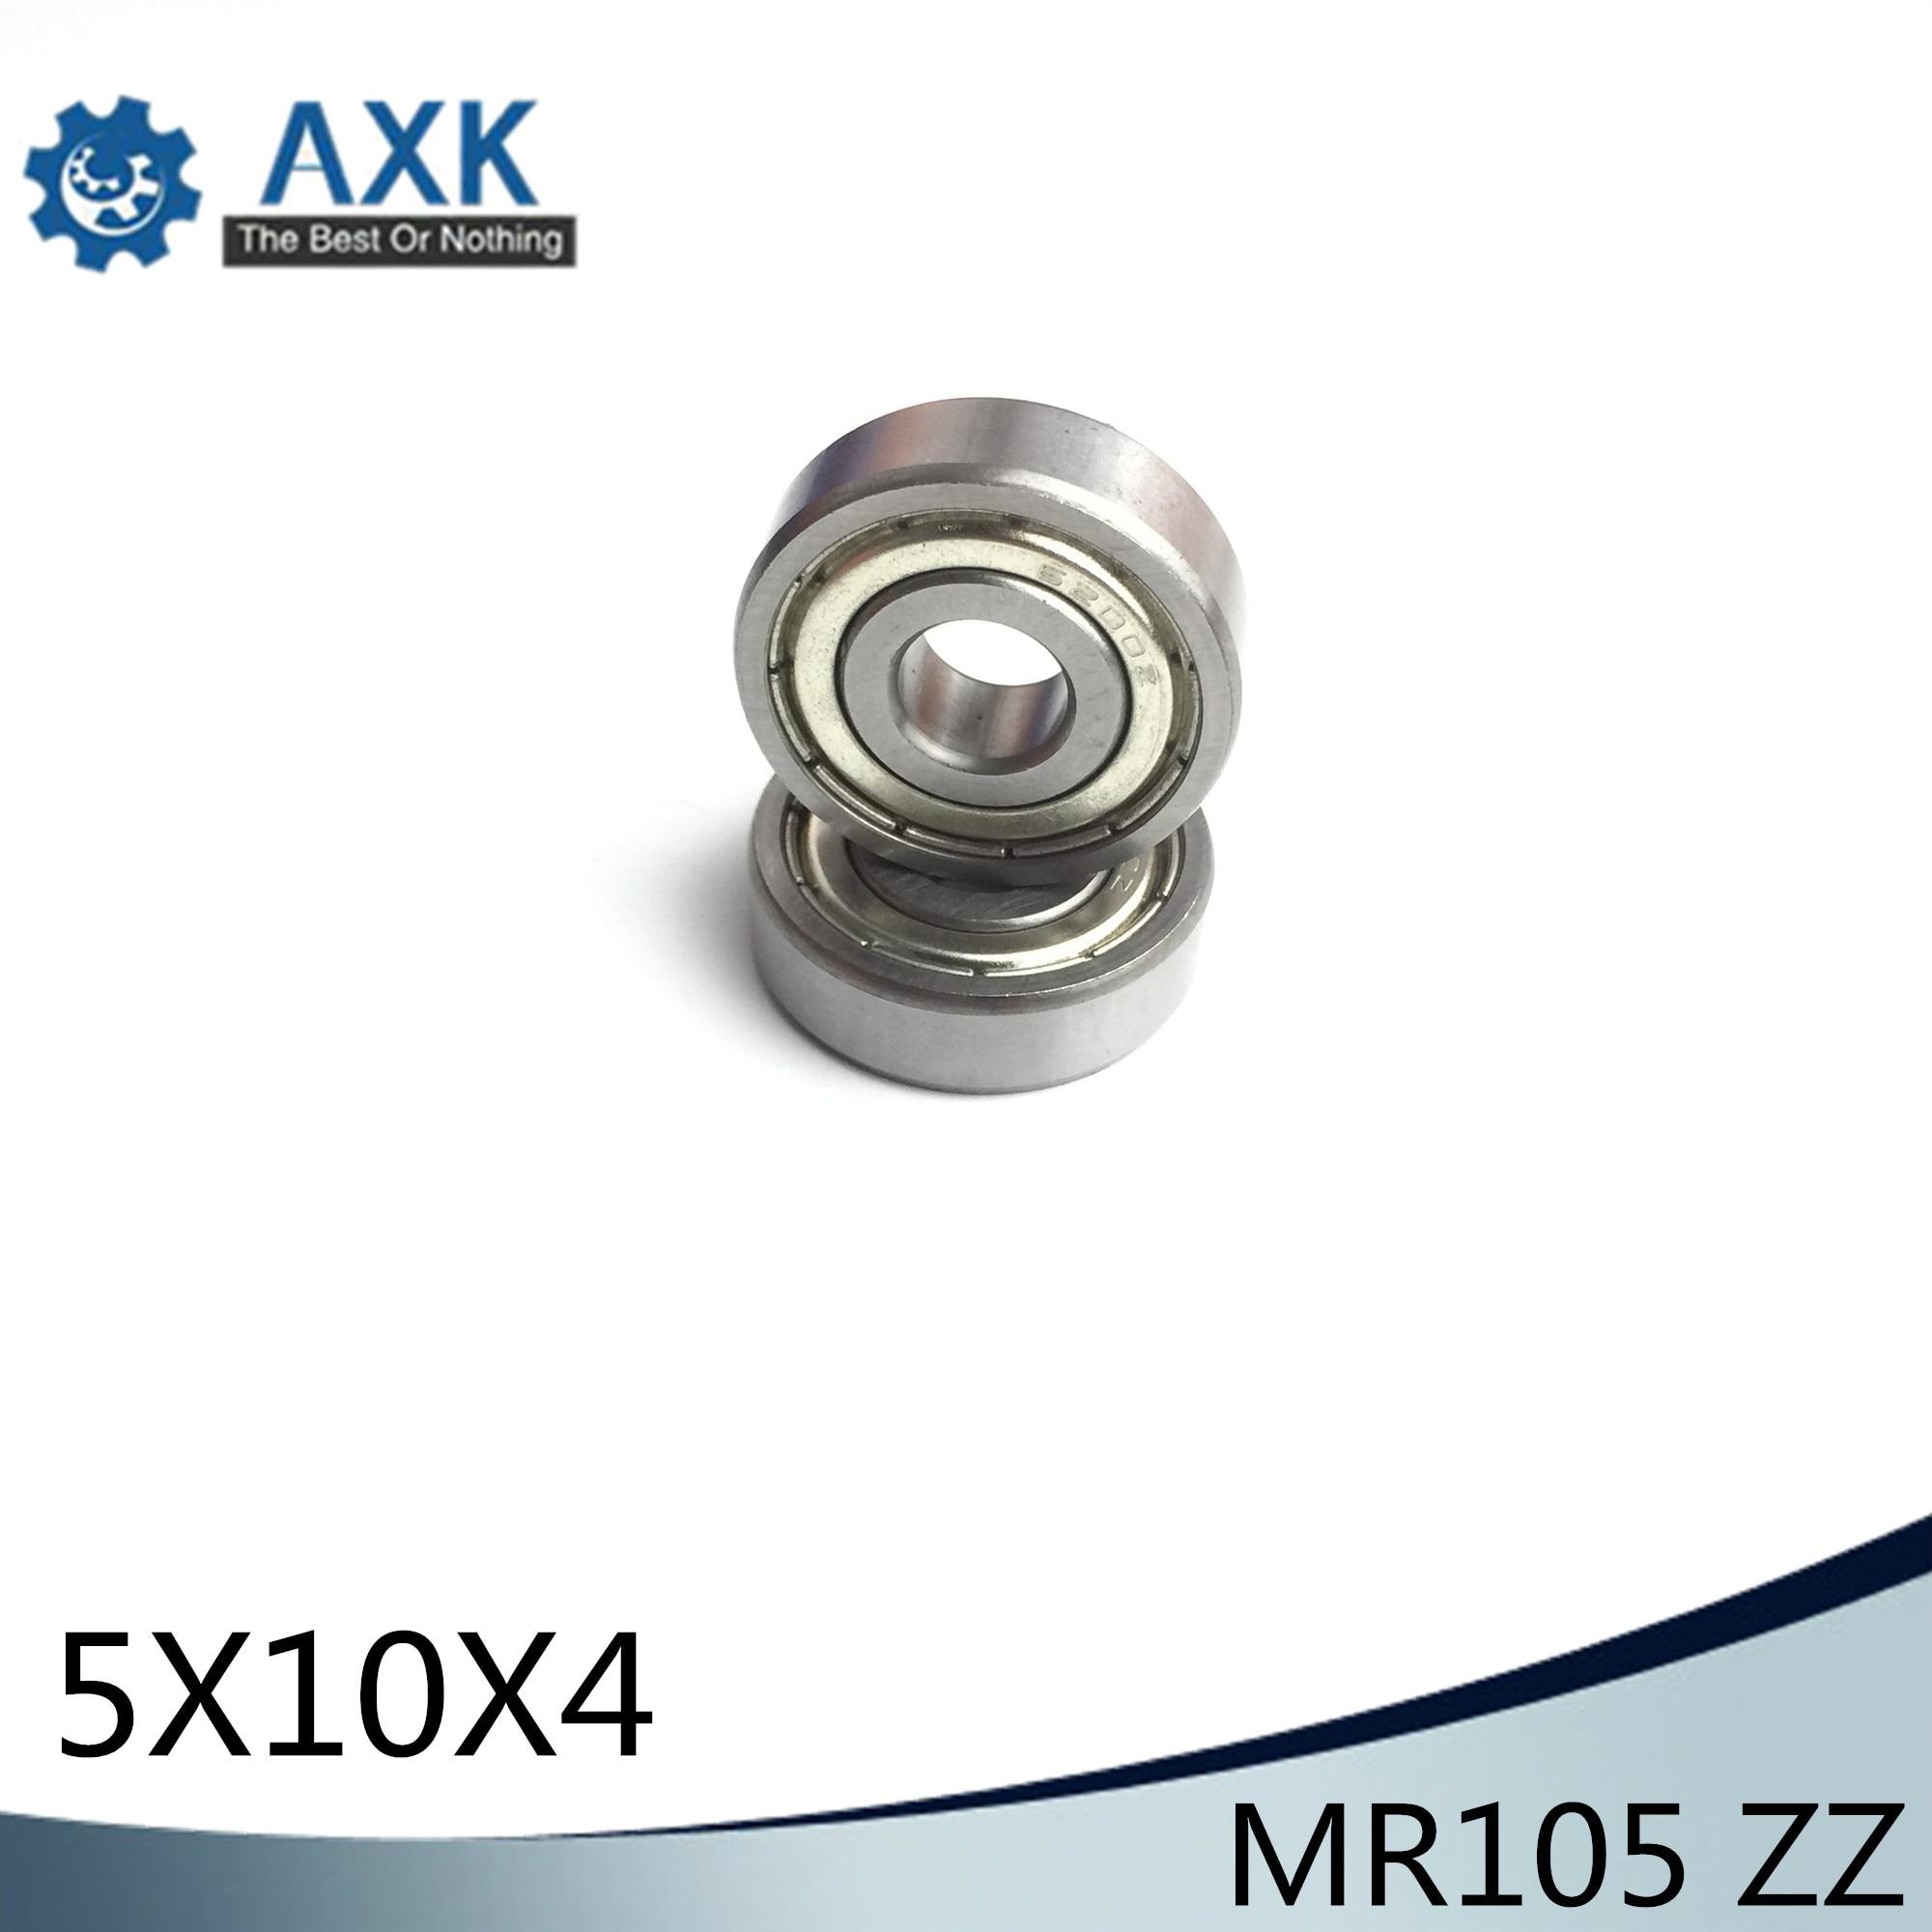 MR105ZZ  ABEC-1 (500PCS) 5X10X4mm  Miniature Ball Bearings L-1050ZZMR105ZZ  ABEC-1 (500PCS) 5X10X4mm  Miniature Ball Bearings L-1050ZZ